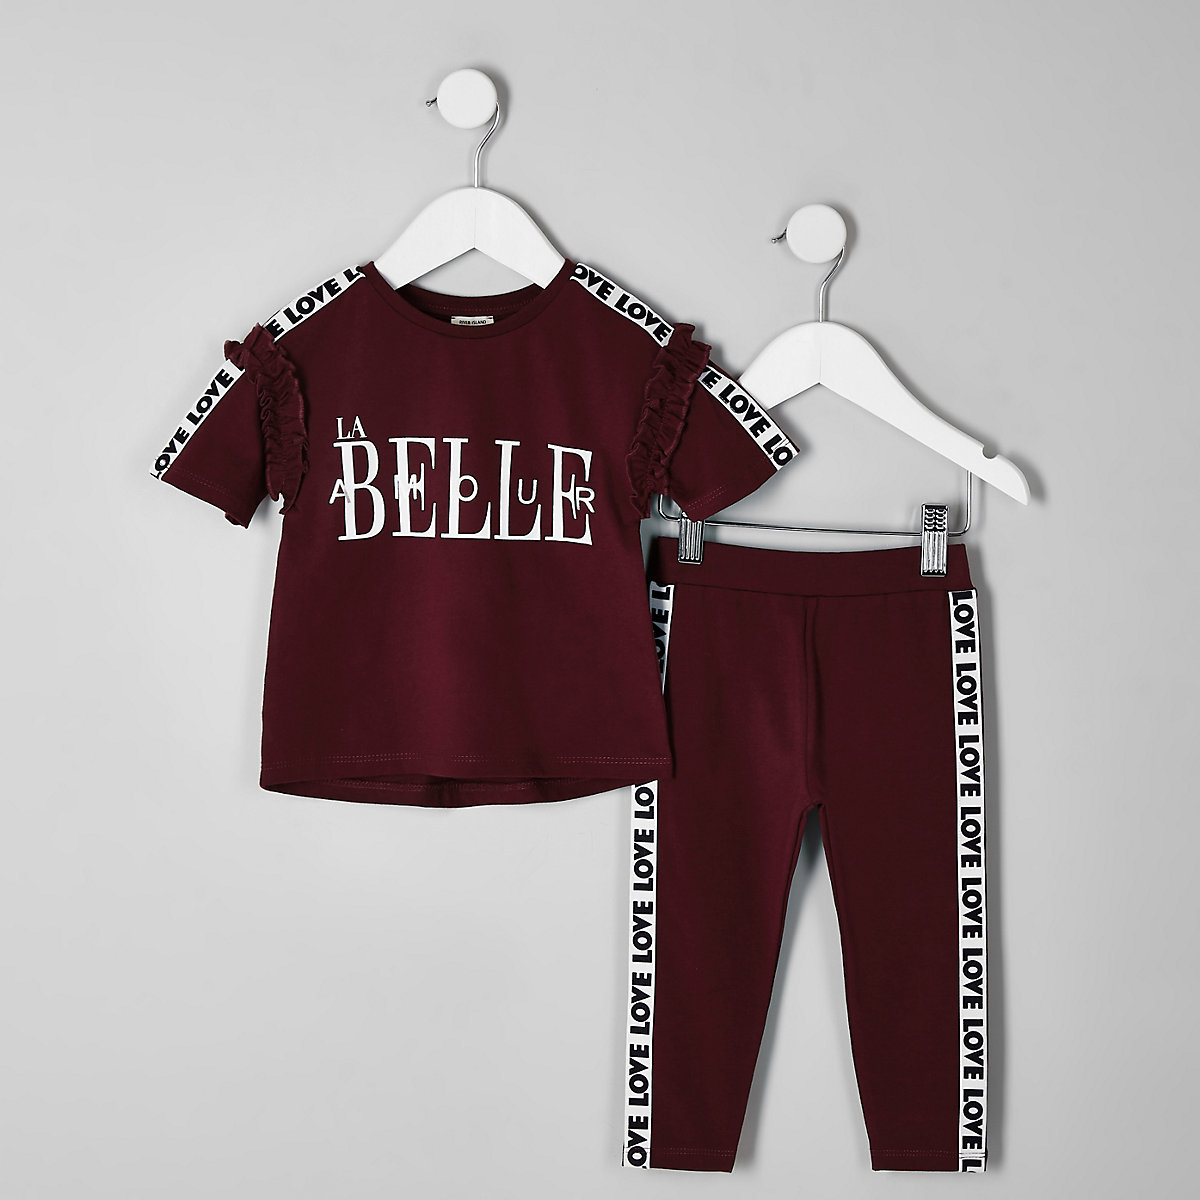 Mini girls purple tape 'Belle' T-shirt outfit